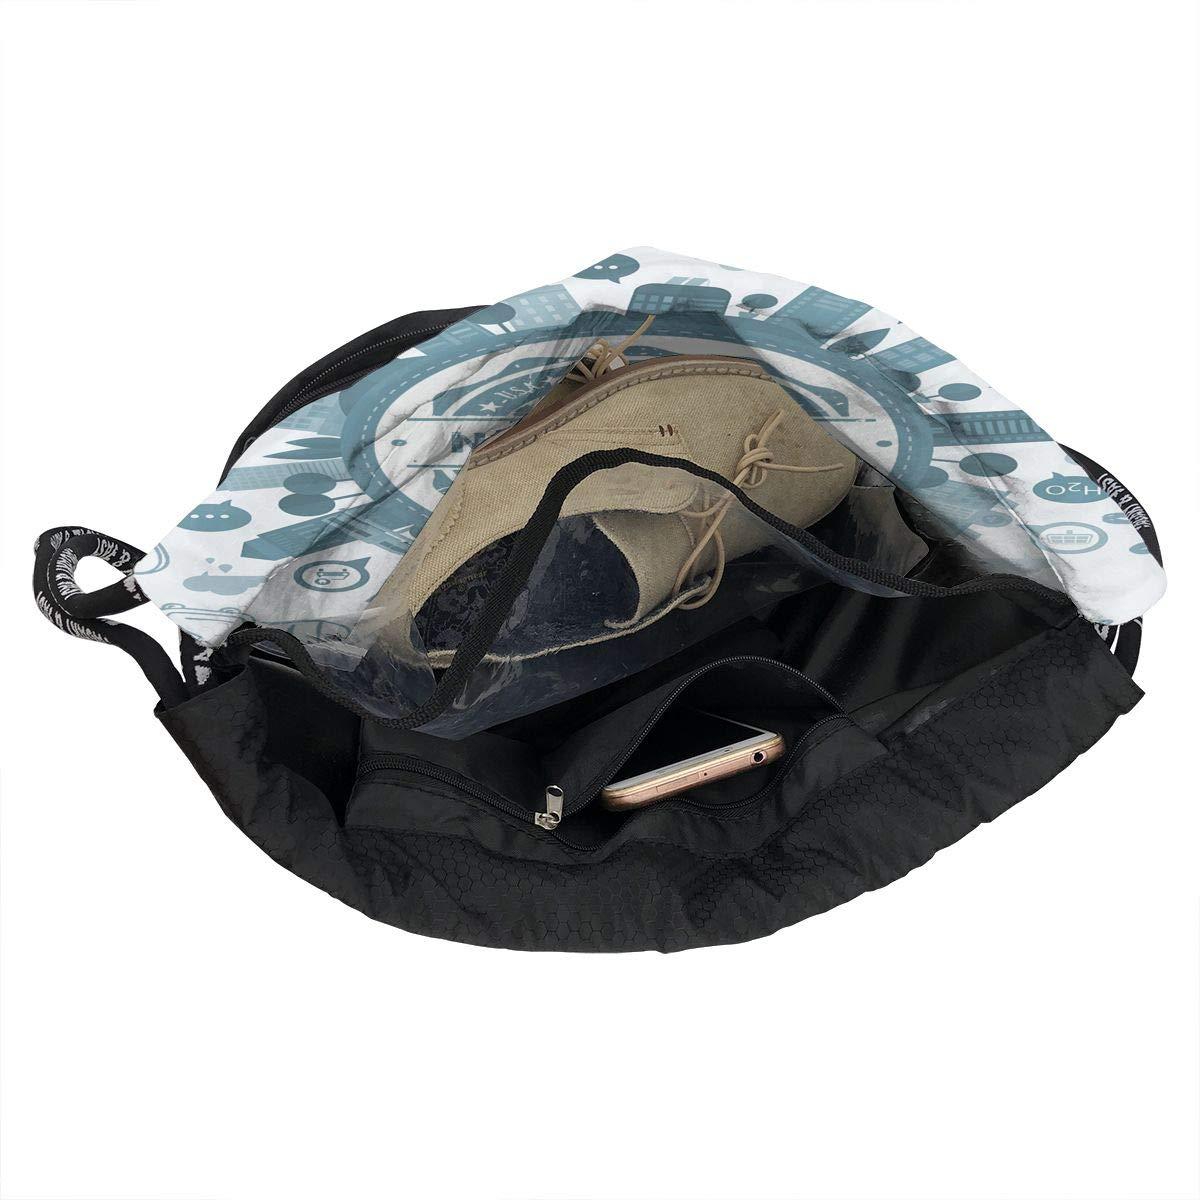 Burst Sackpack X-JUSEN Print Bloomington Multi-Function Drawstring Bundle Backpack Tote Cinch Sack Gym Bag Pocket Daypack